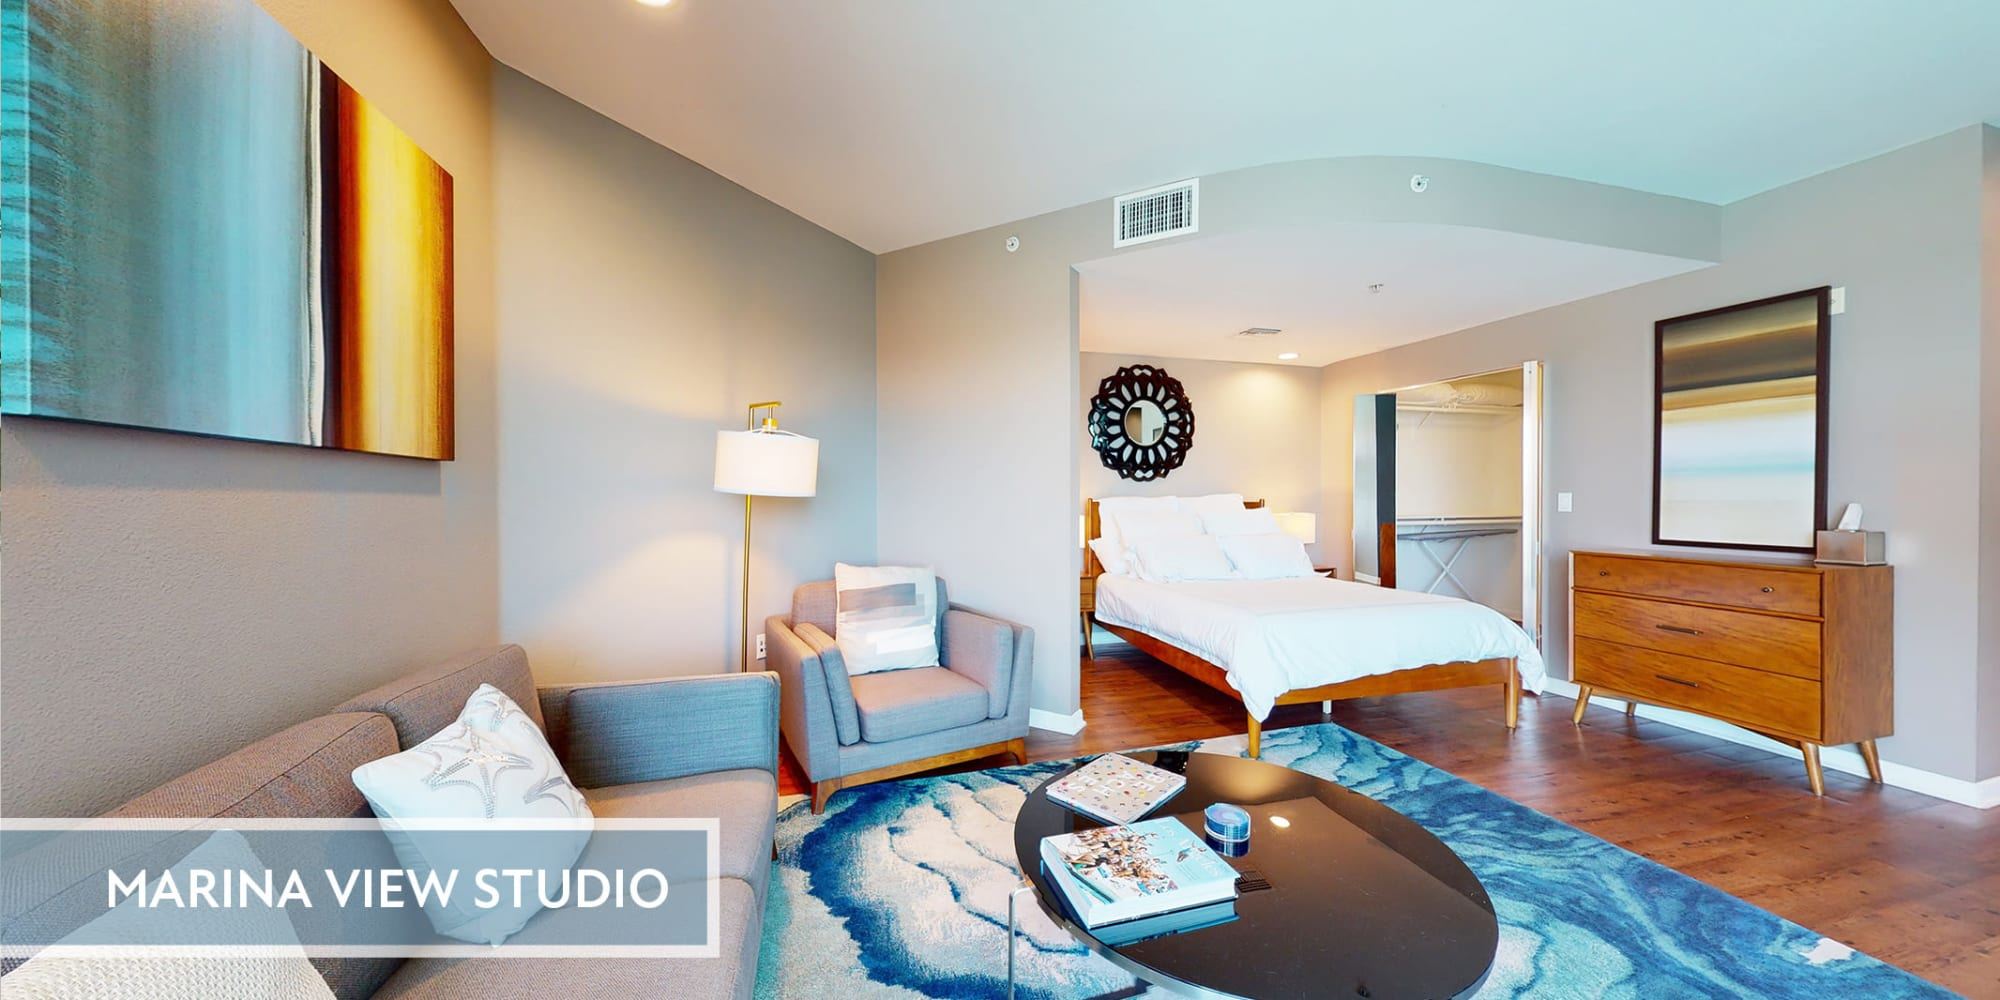 Spacious studio apartment at Esprit Marina del Rey in Marina del Rey, California